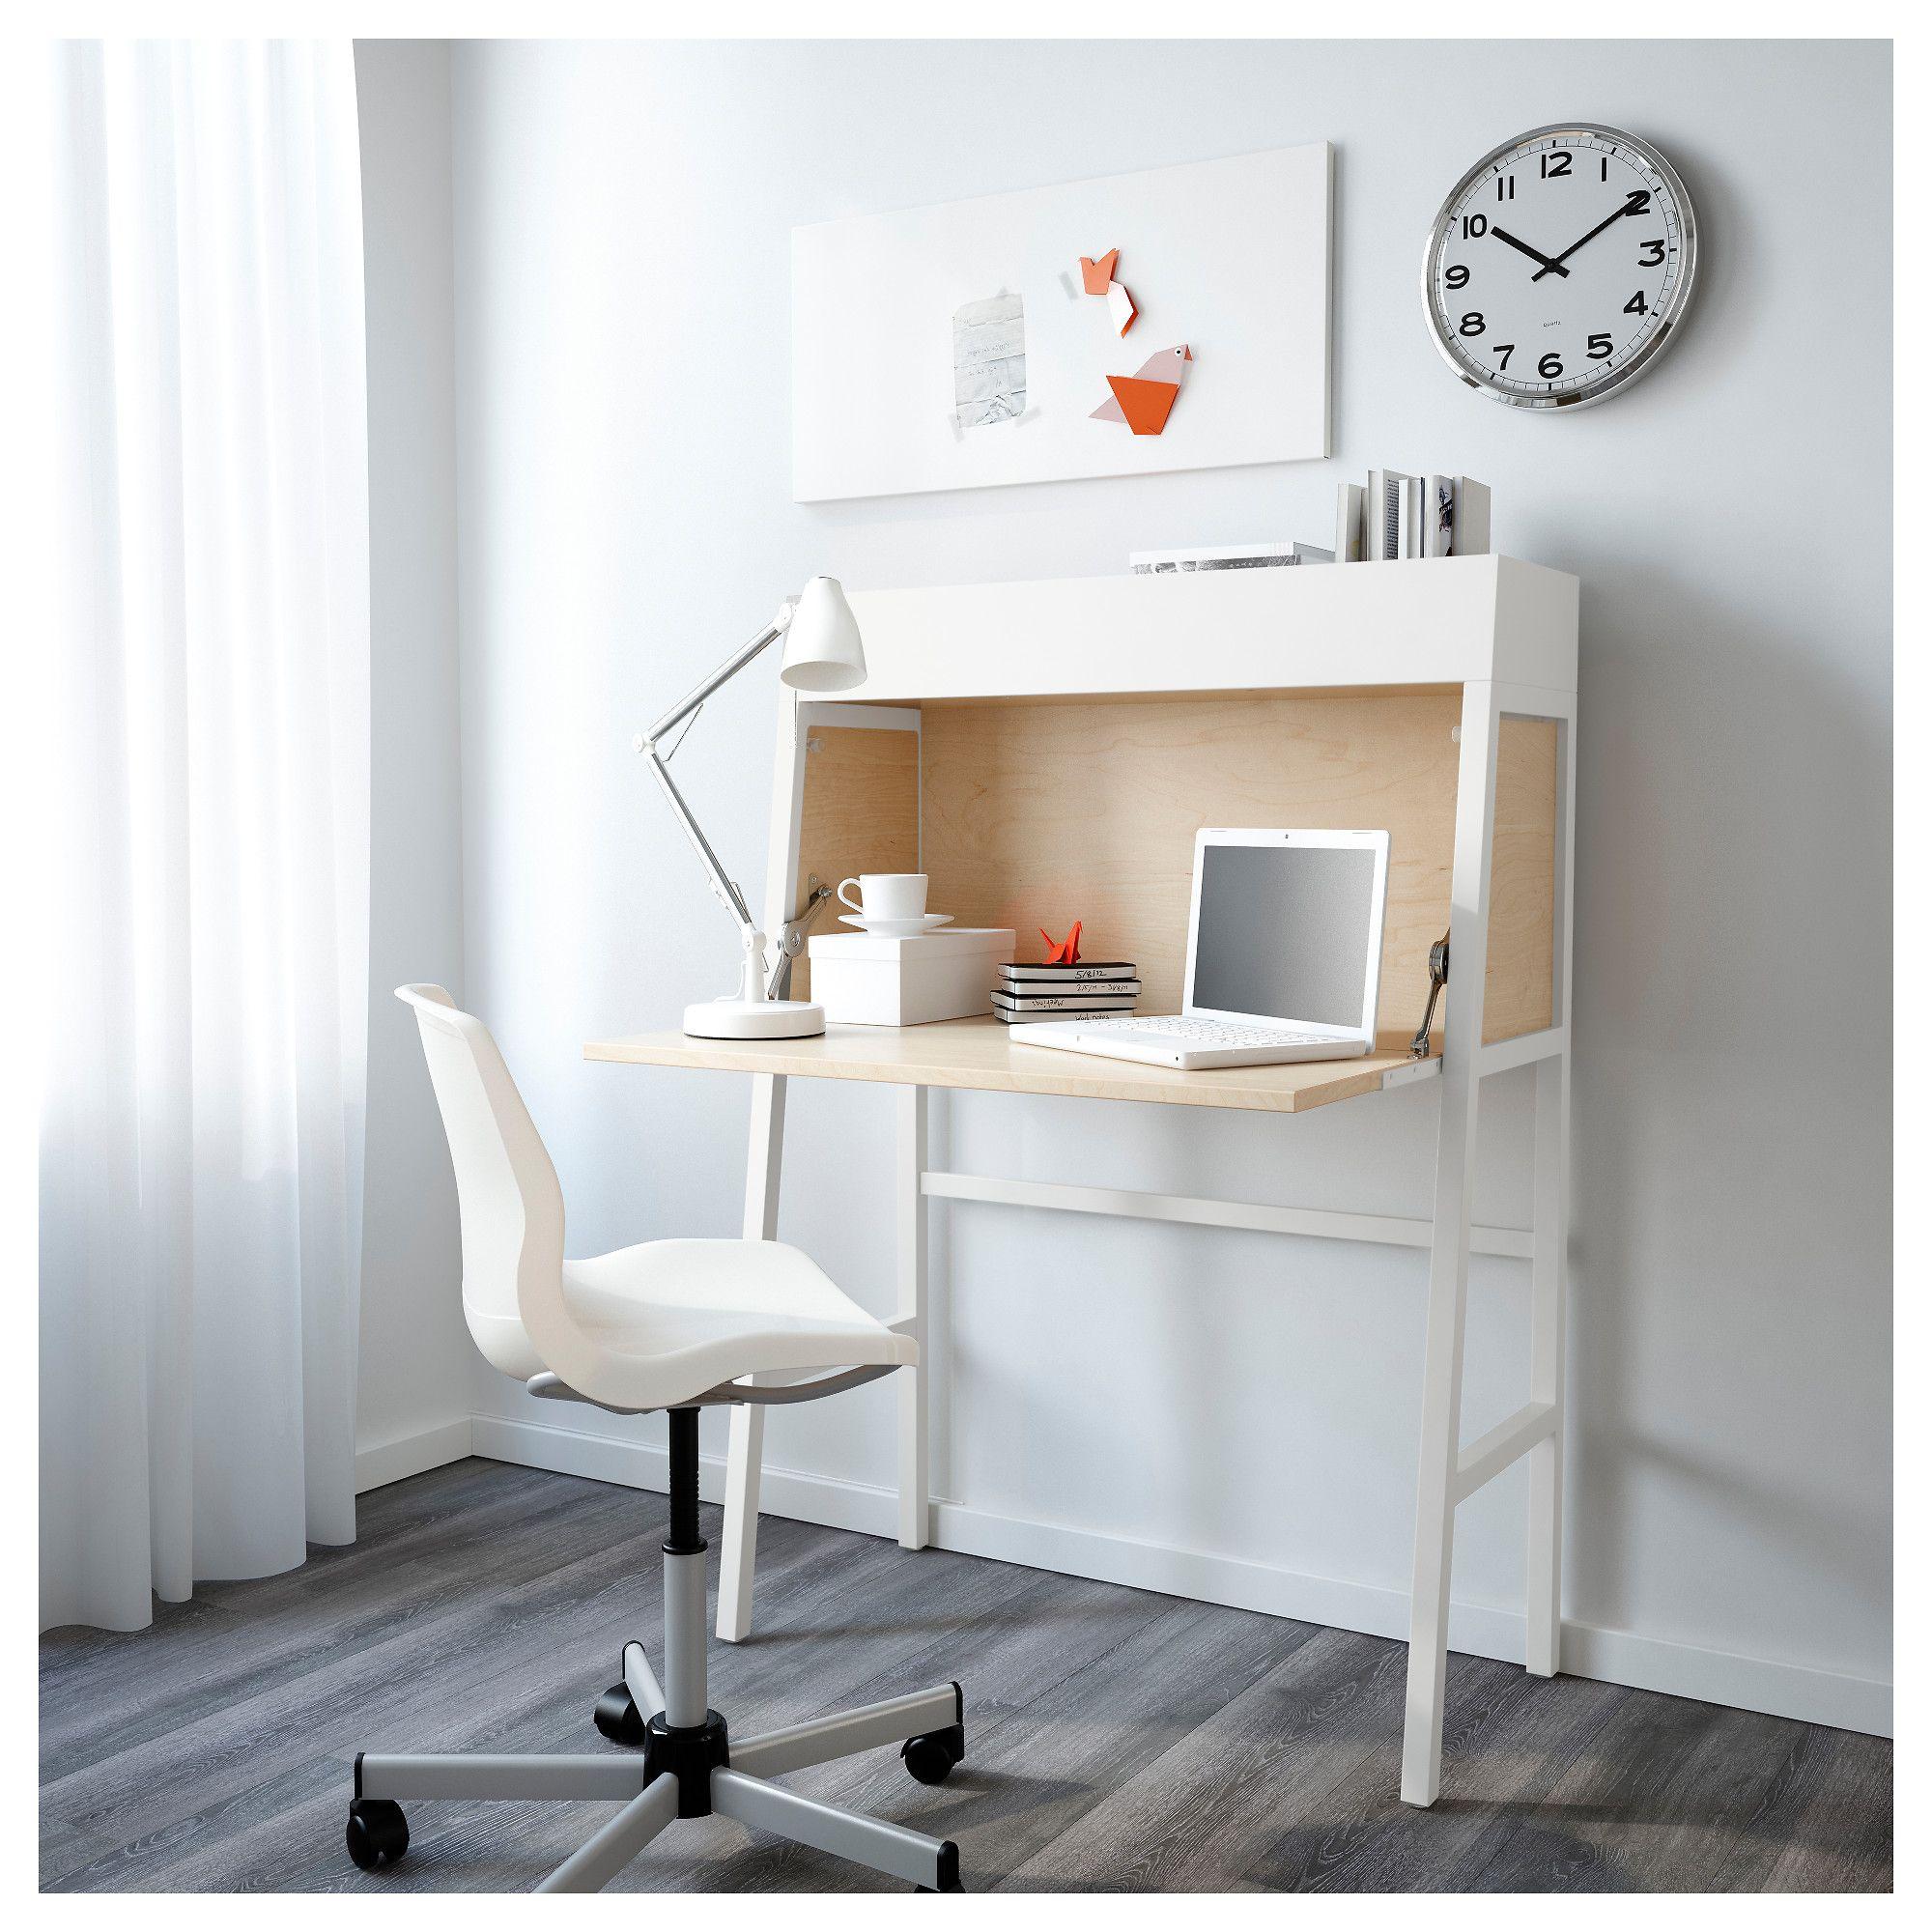 IKEA PS 2014 Bureau White/birch veneer IKEA Ikea small